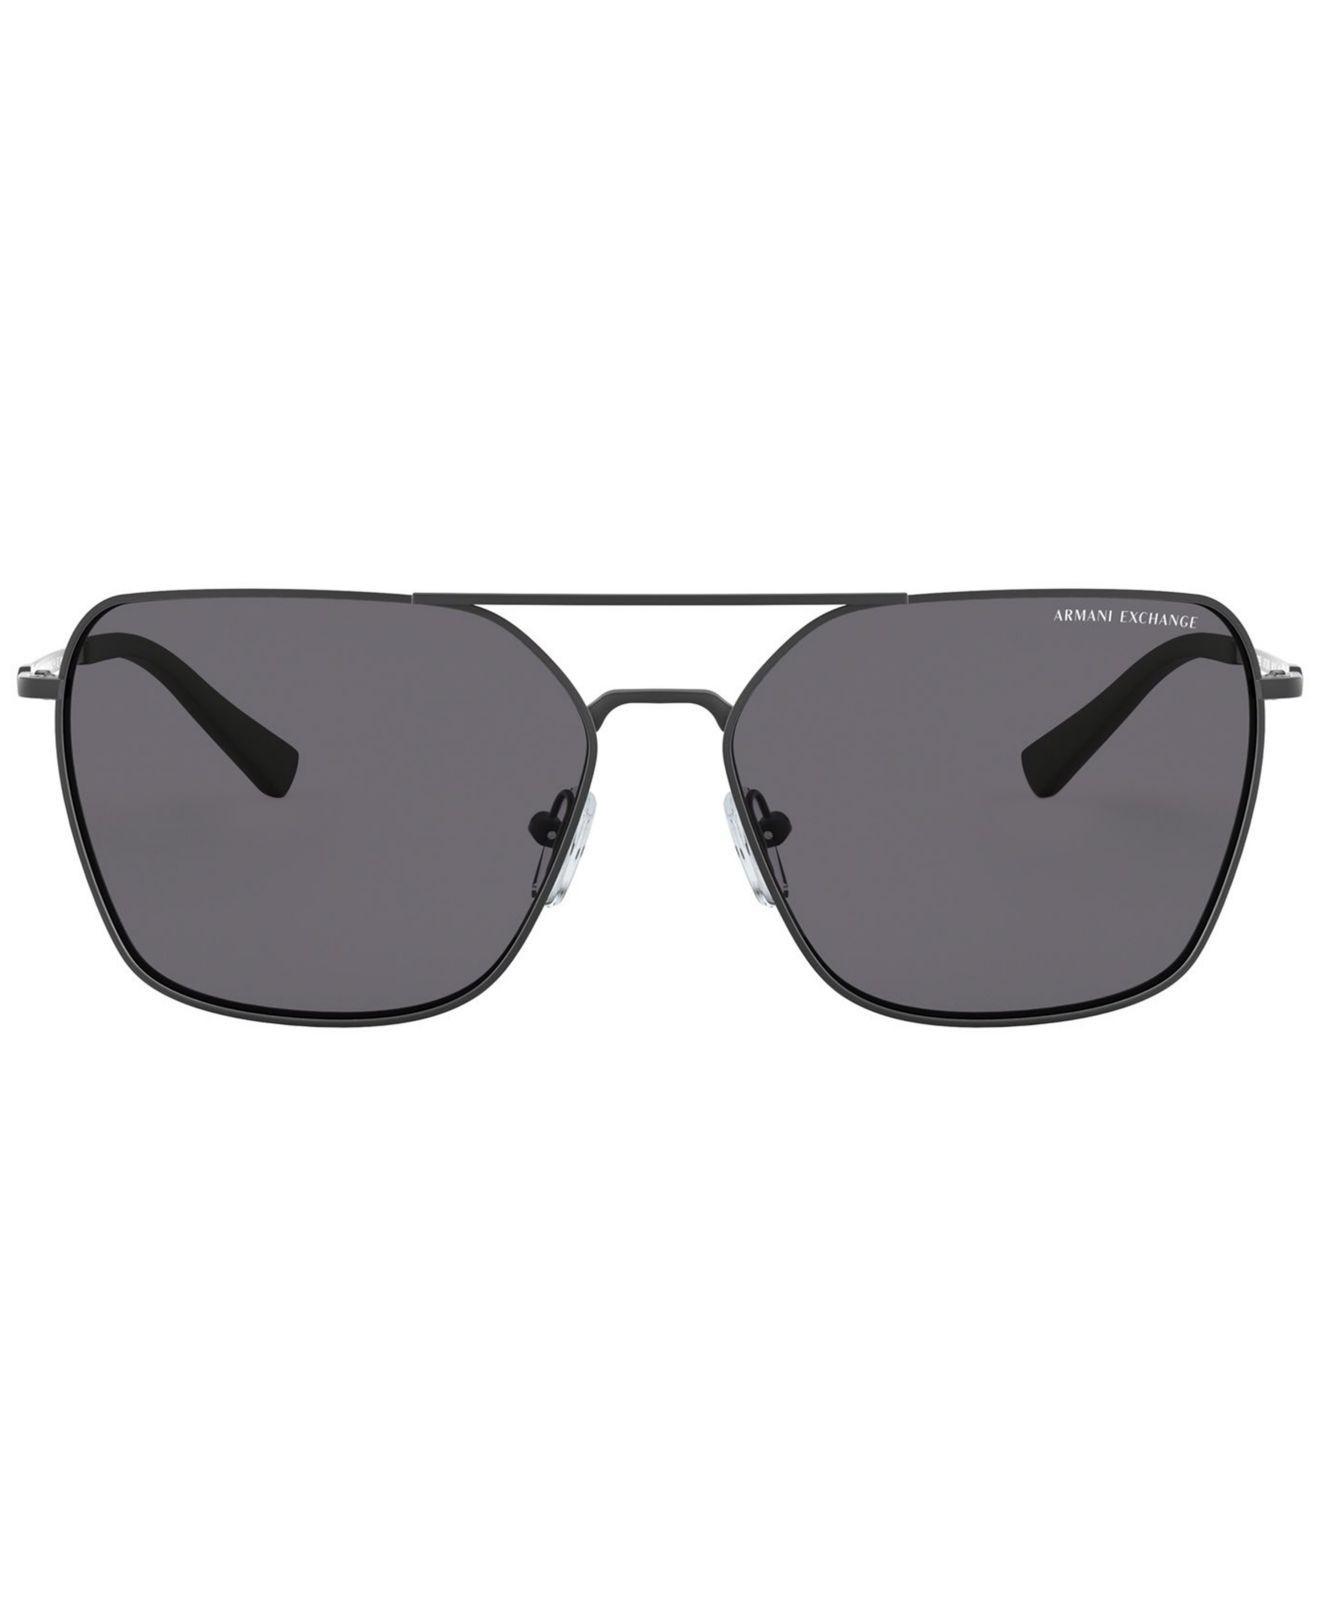 d80ede7ca71a Lyst - Armani Exchange Polarized Sunglasses